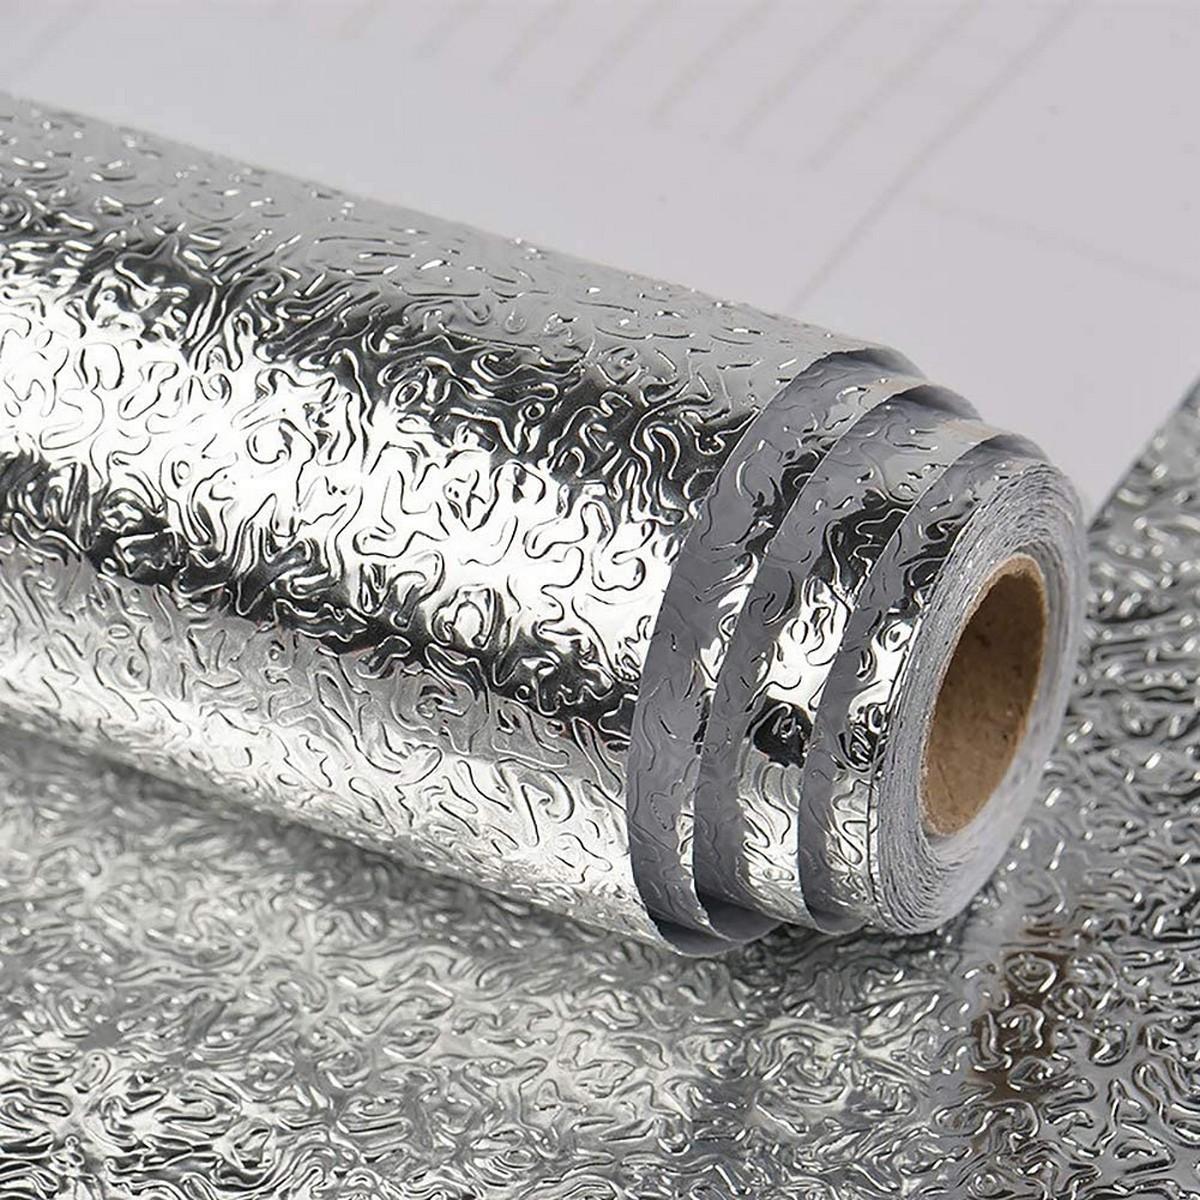 Self Adhesive Aluminum Foil Sticker Roll, Oil Proof Waterproof Aluminum Sheet DIY Wallpaper, Heat Resistant Backsplash Aluminum Sticker for Home, Kitchen, Stove, Cabinet, Wall, Drawers, Furniture, Silver Color